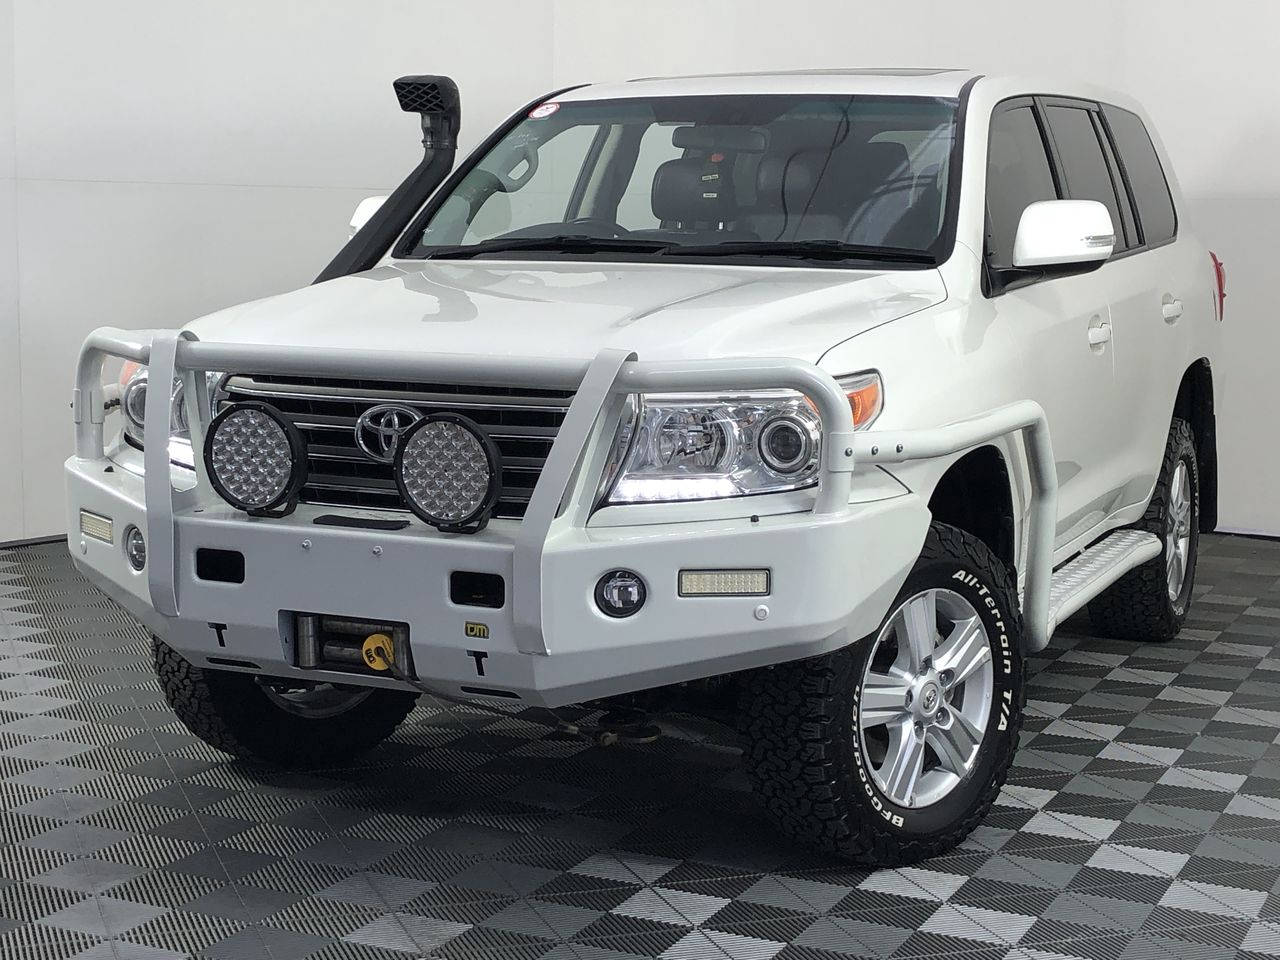 2014 Toyota Landcruiser VX (4x4) VDJ200R Turbo Diesel Automatic 7 Seats